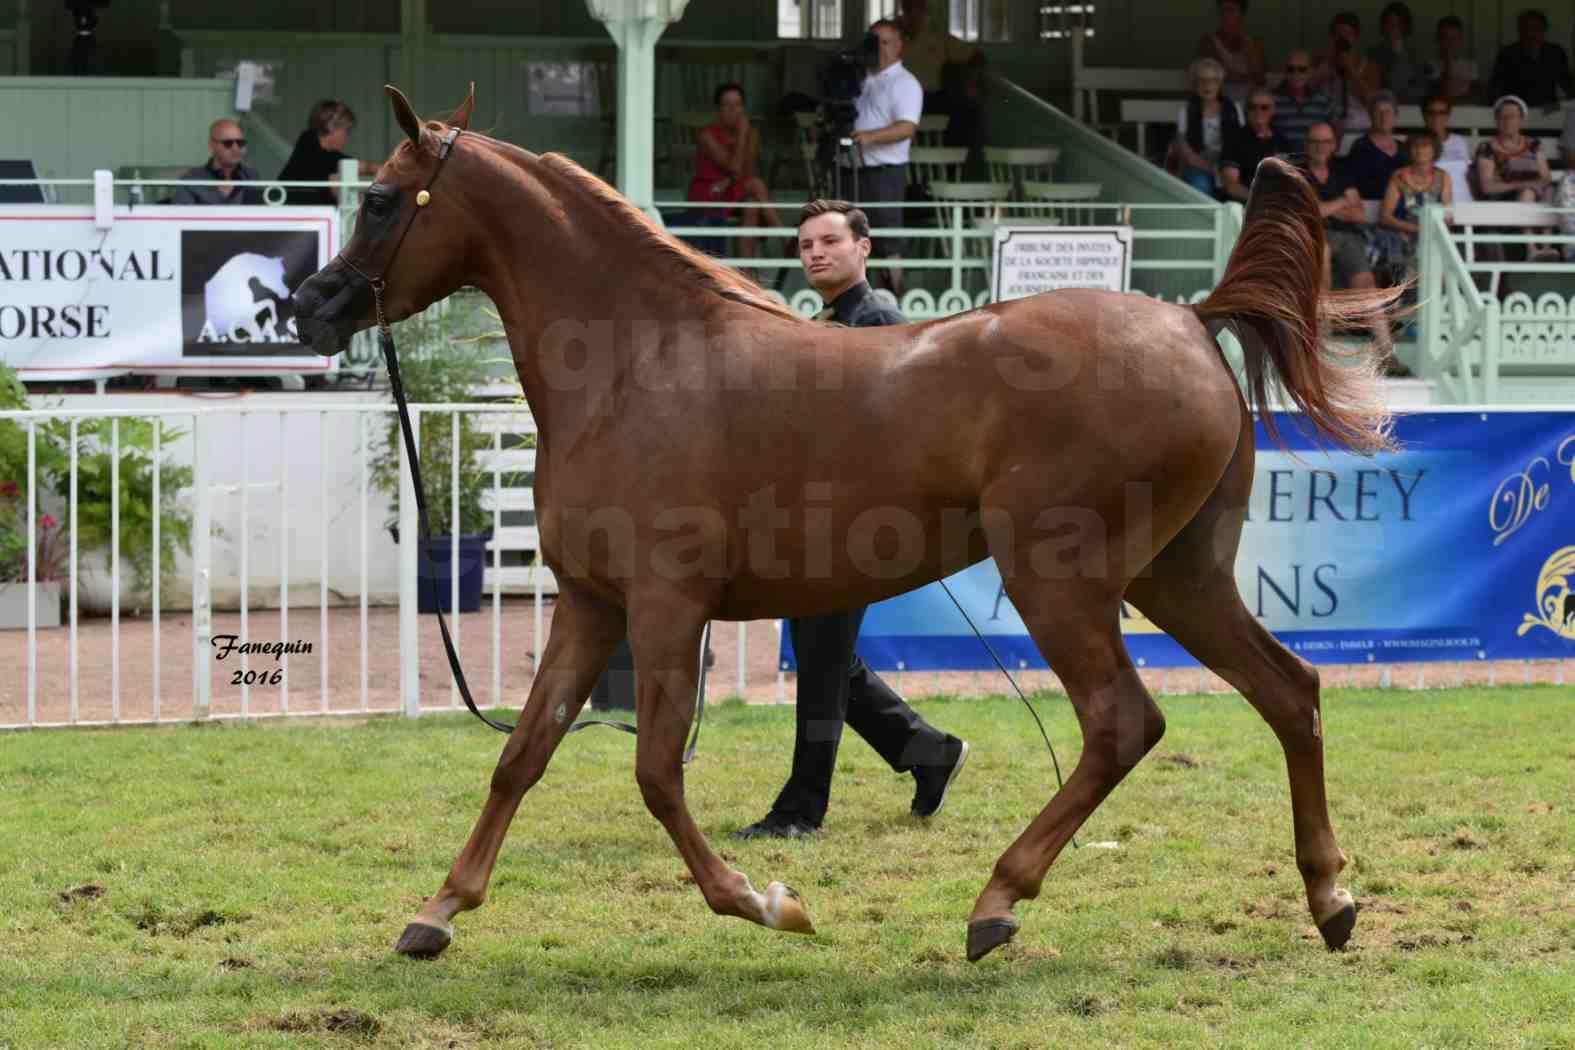 International Arabian Horse Show B de VICHY 2016 - PEARL DE DJOON - Notre Sélection - 31